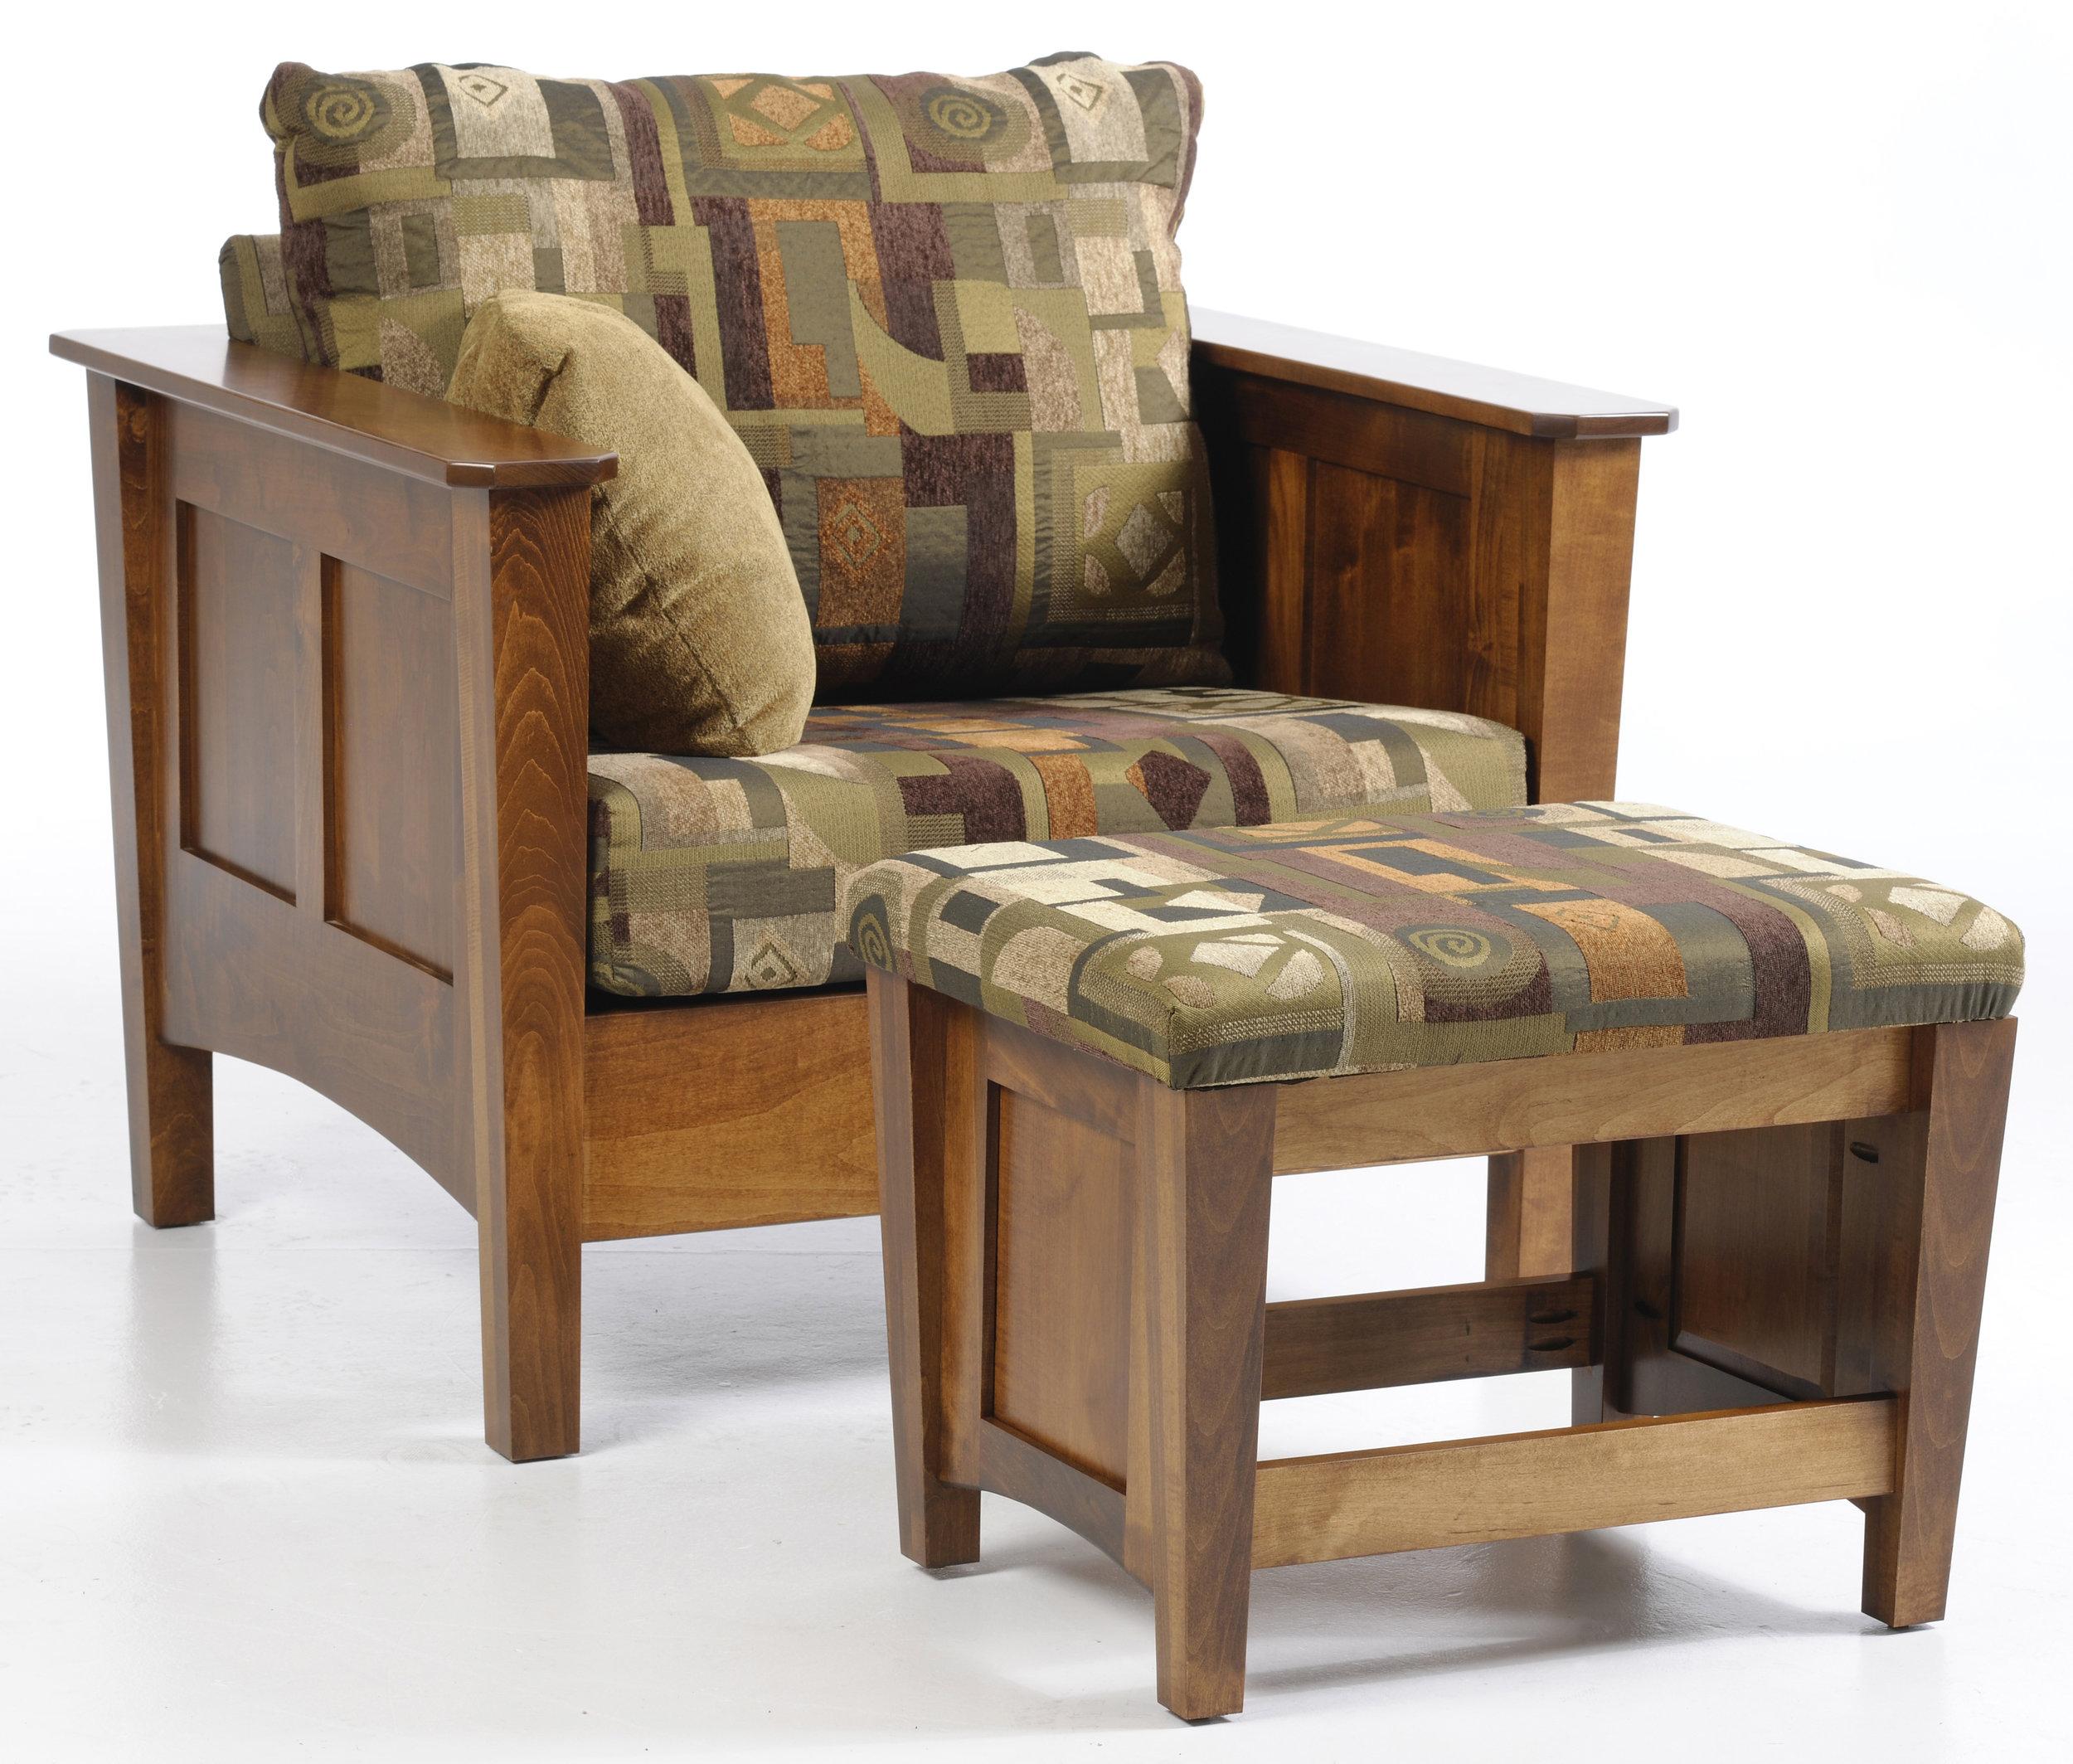 urban shaker chair and ottoman